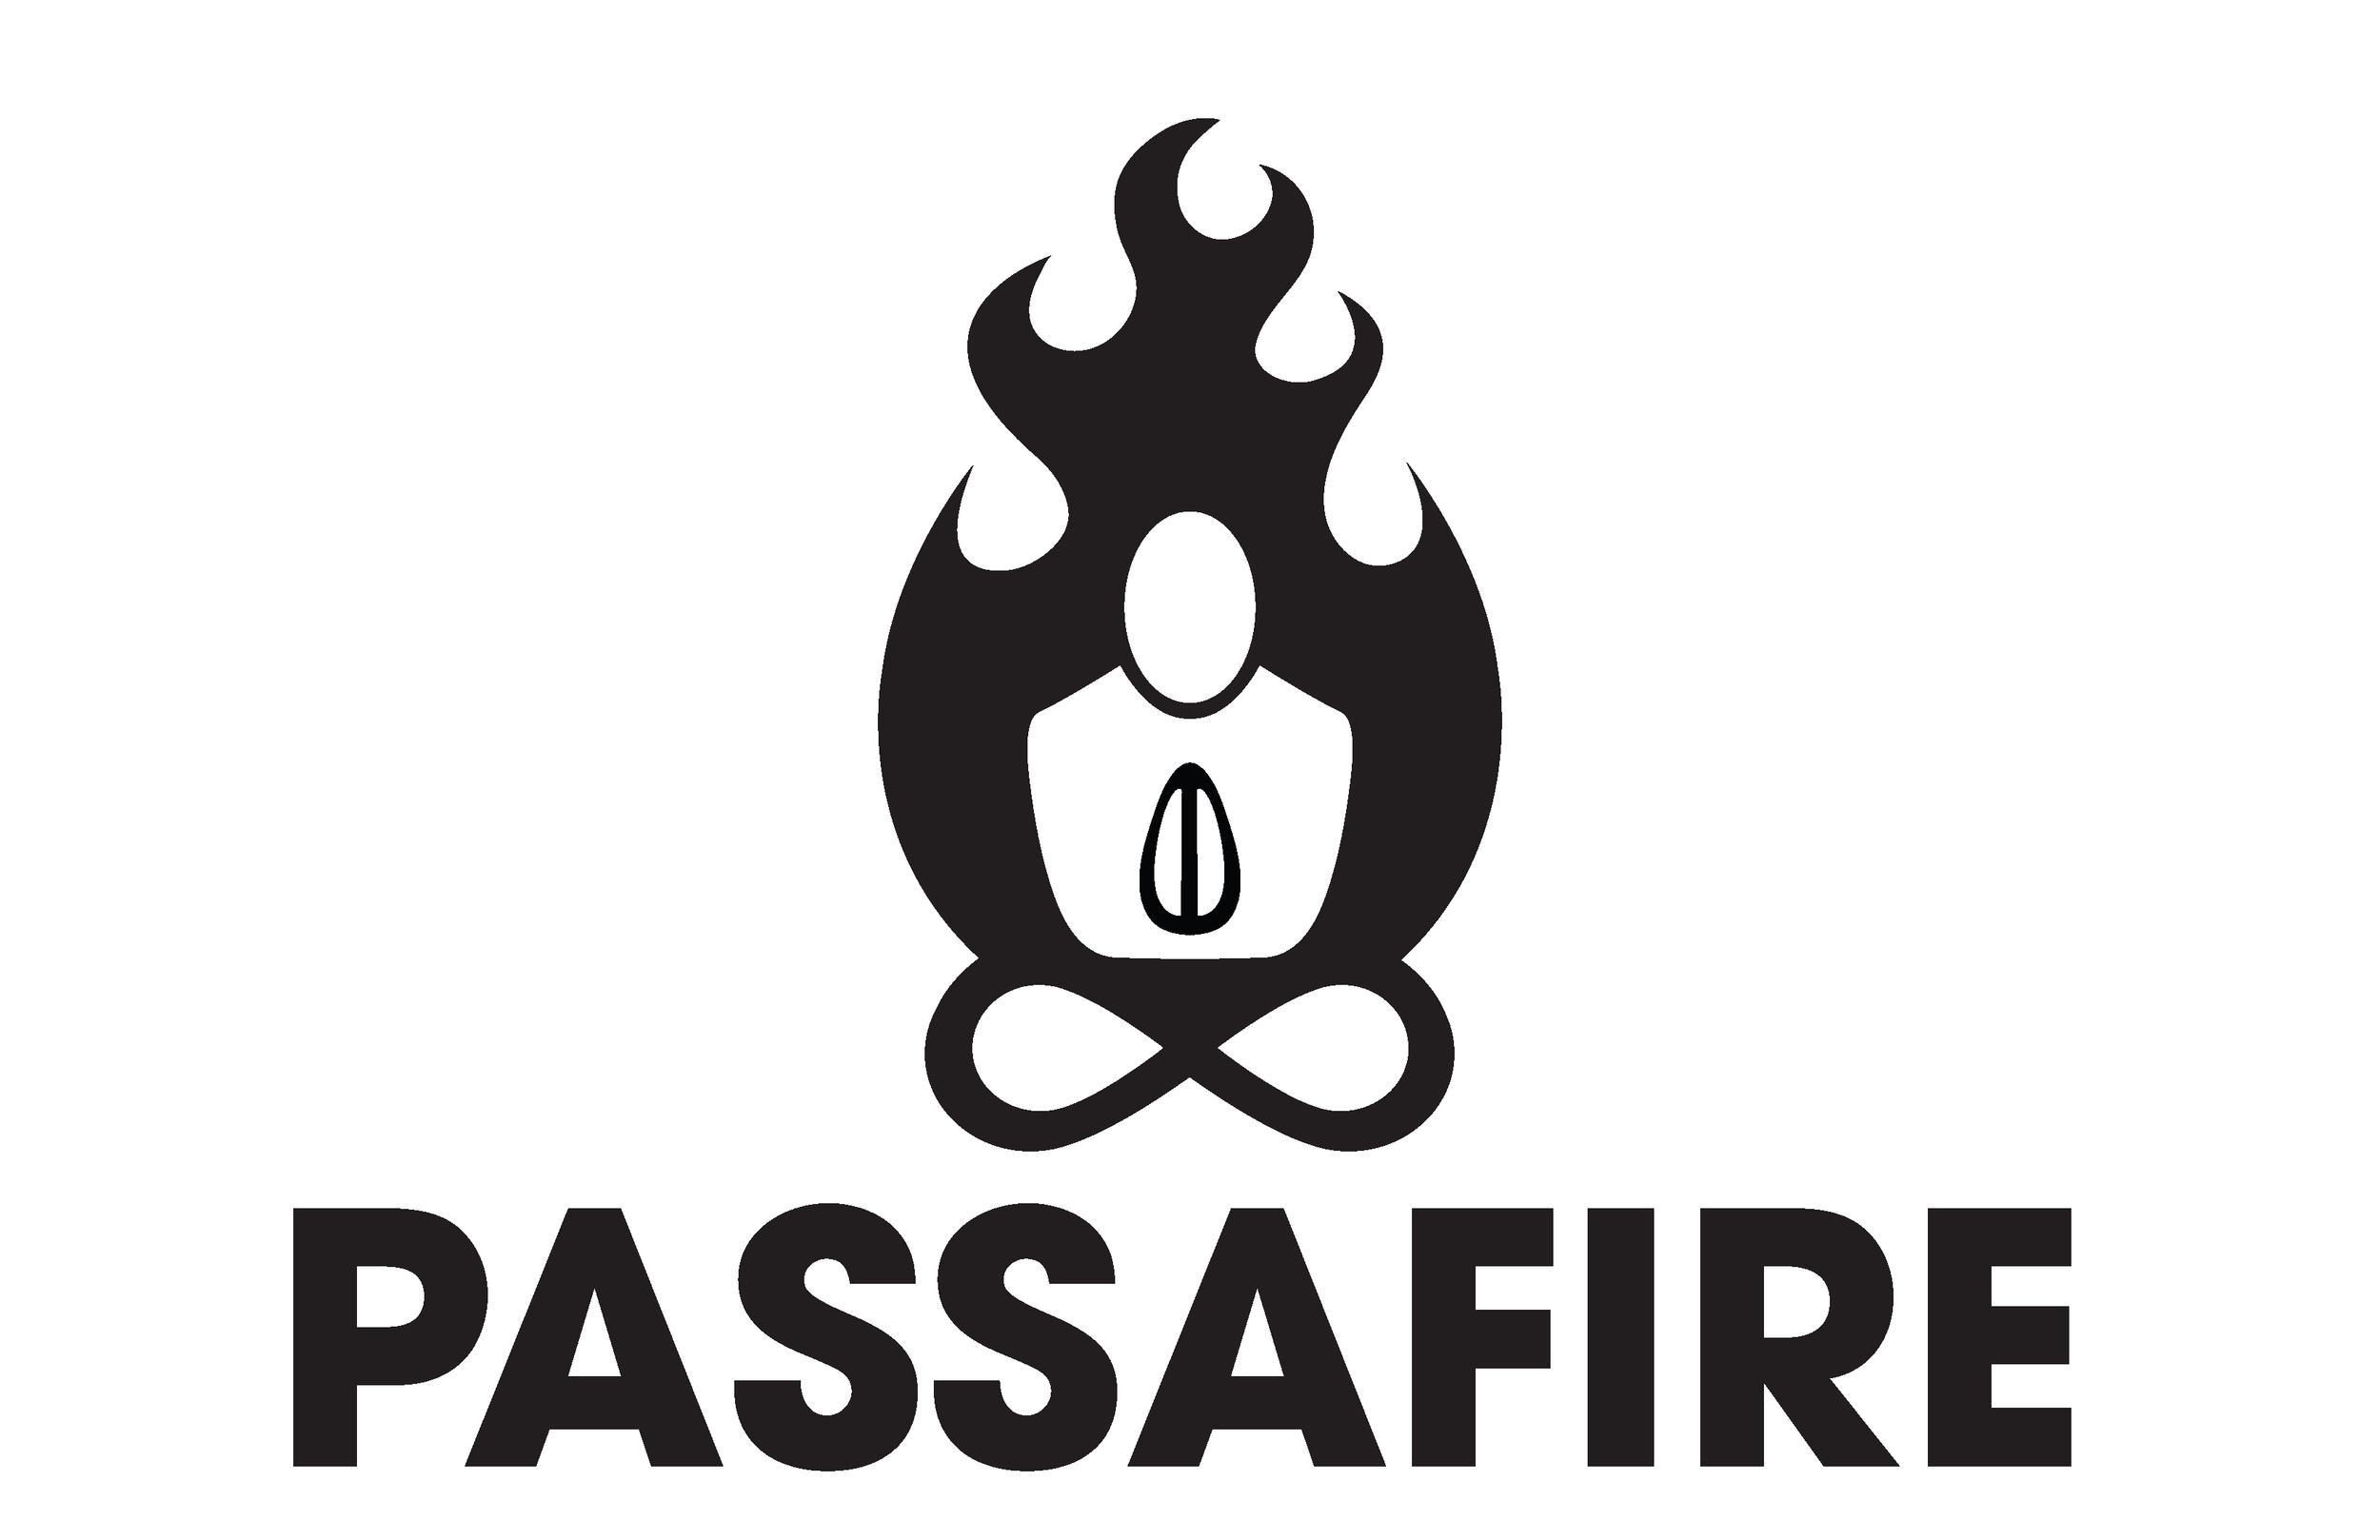 Passafire_LogoV2.png